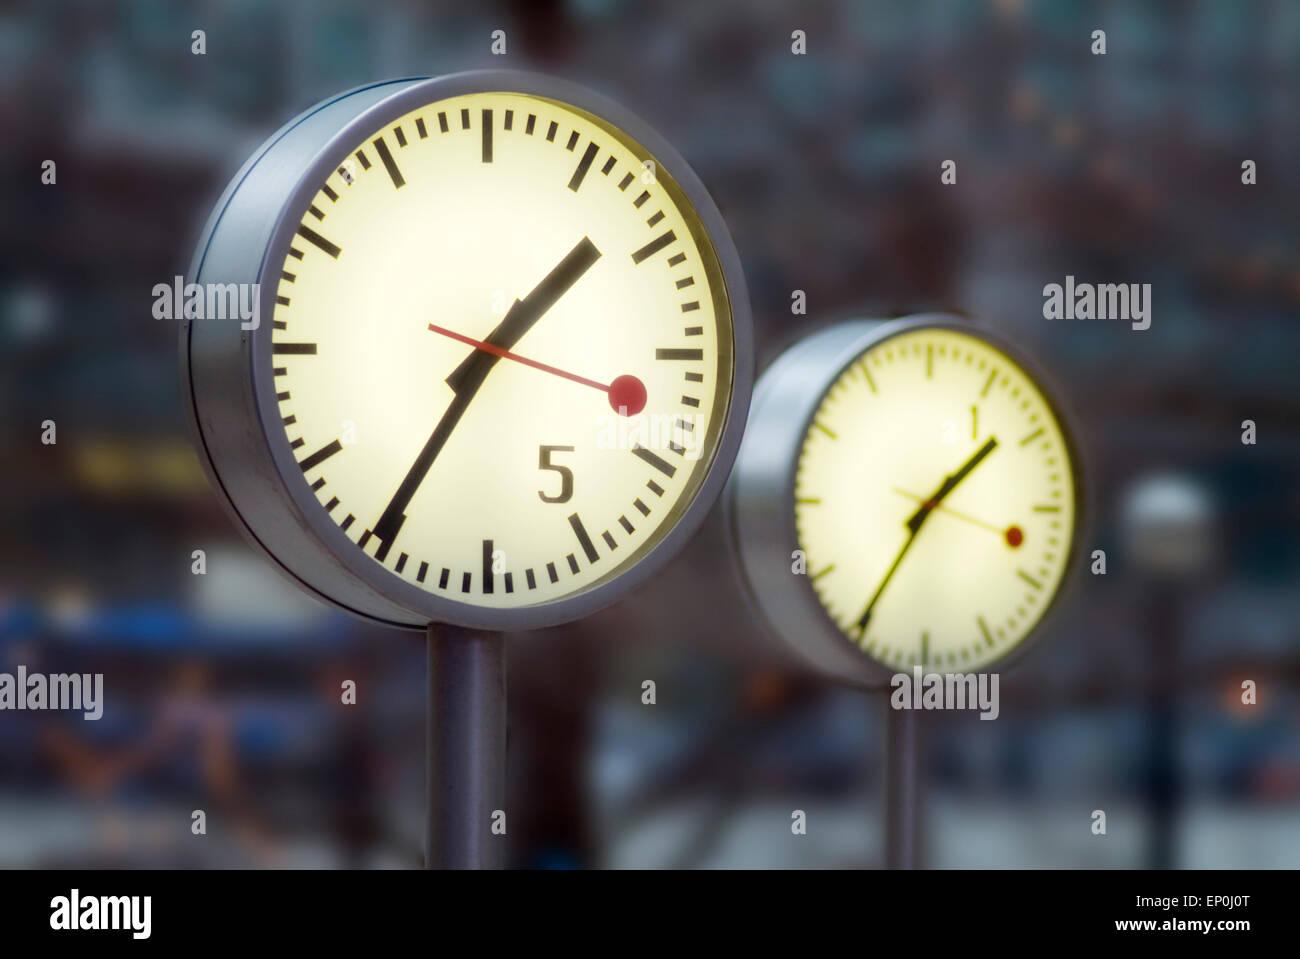 Clocks in Canary wharf, London, GB, Europe - Stock Image